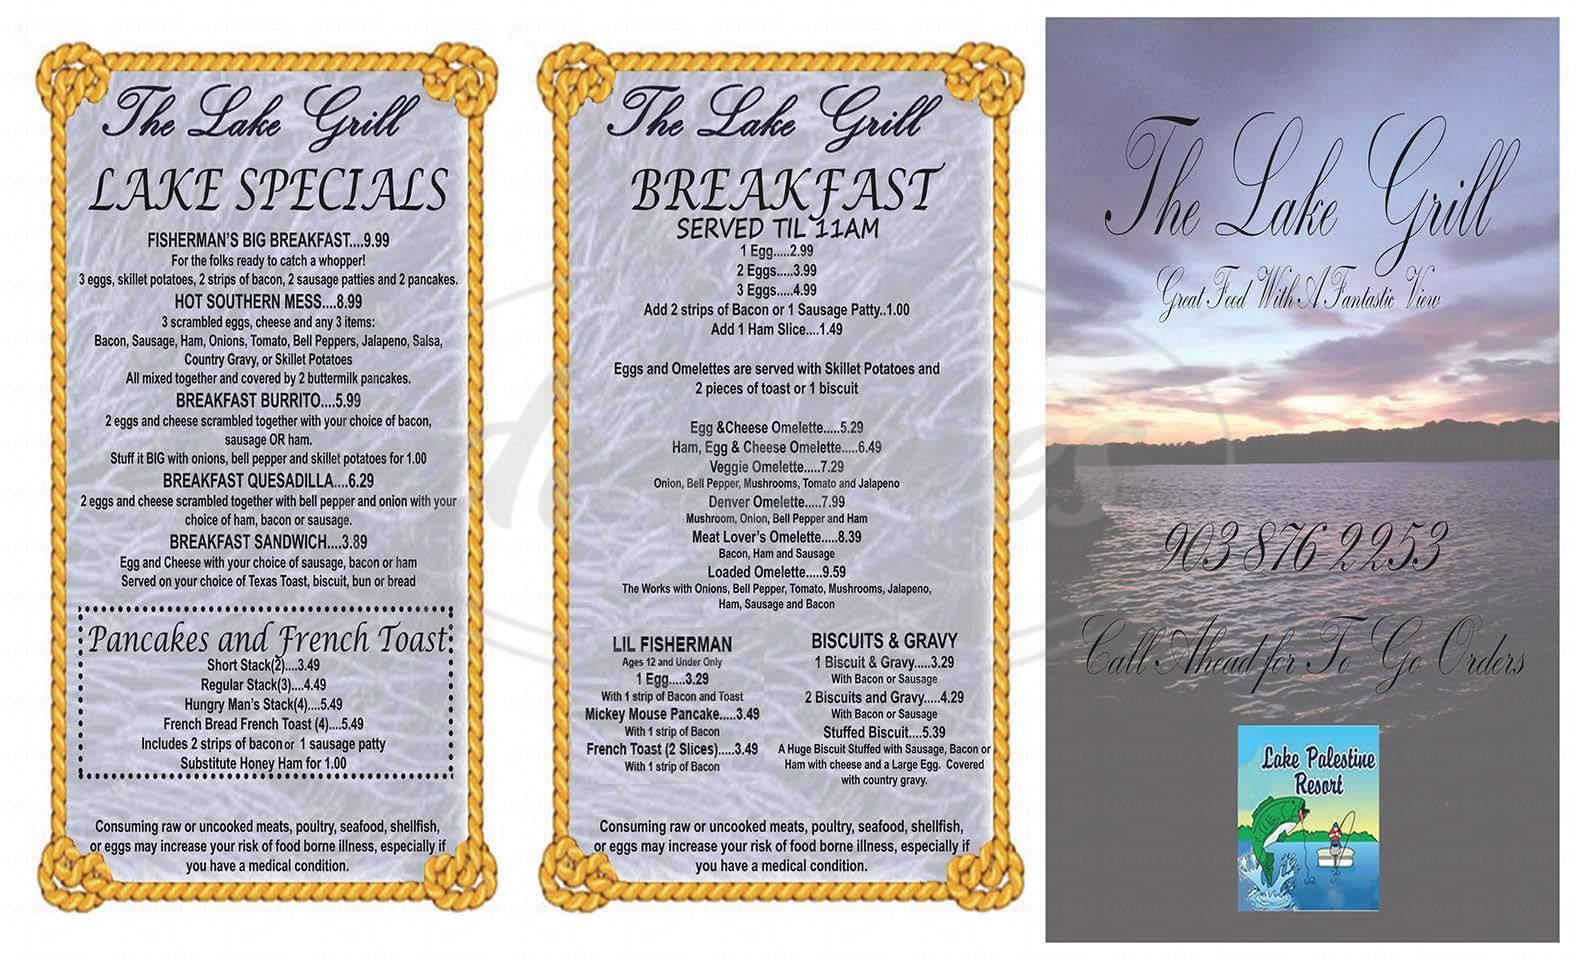 menu for The Lake Grill at Lake Palestine Resort